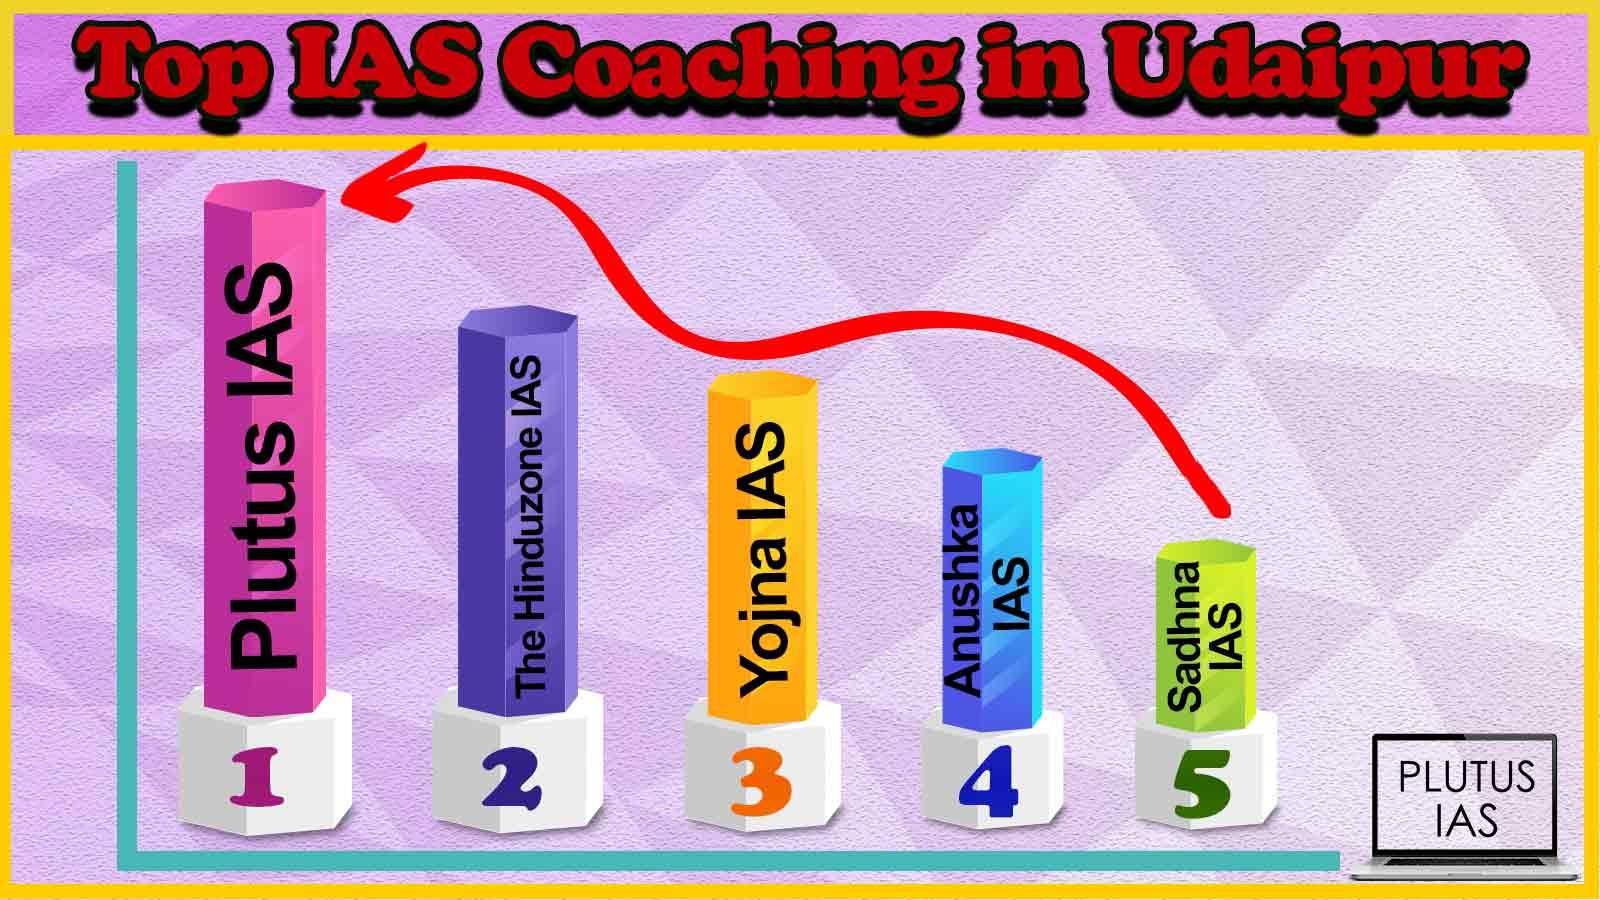 Best 10 IAS Coaching in Udaipur